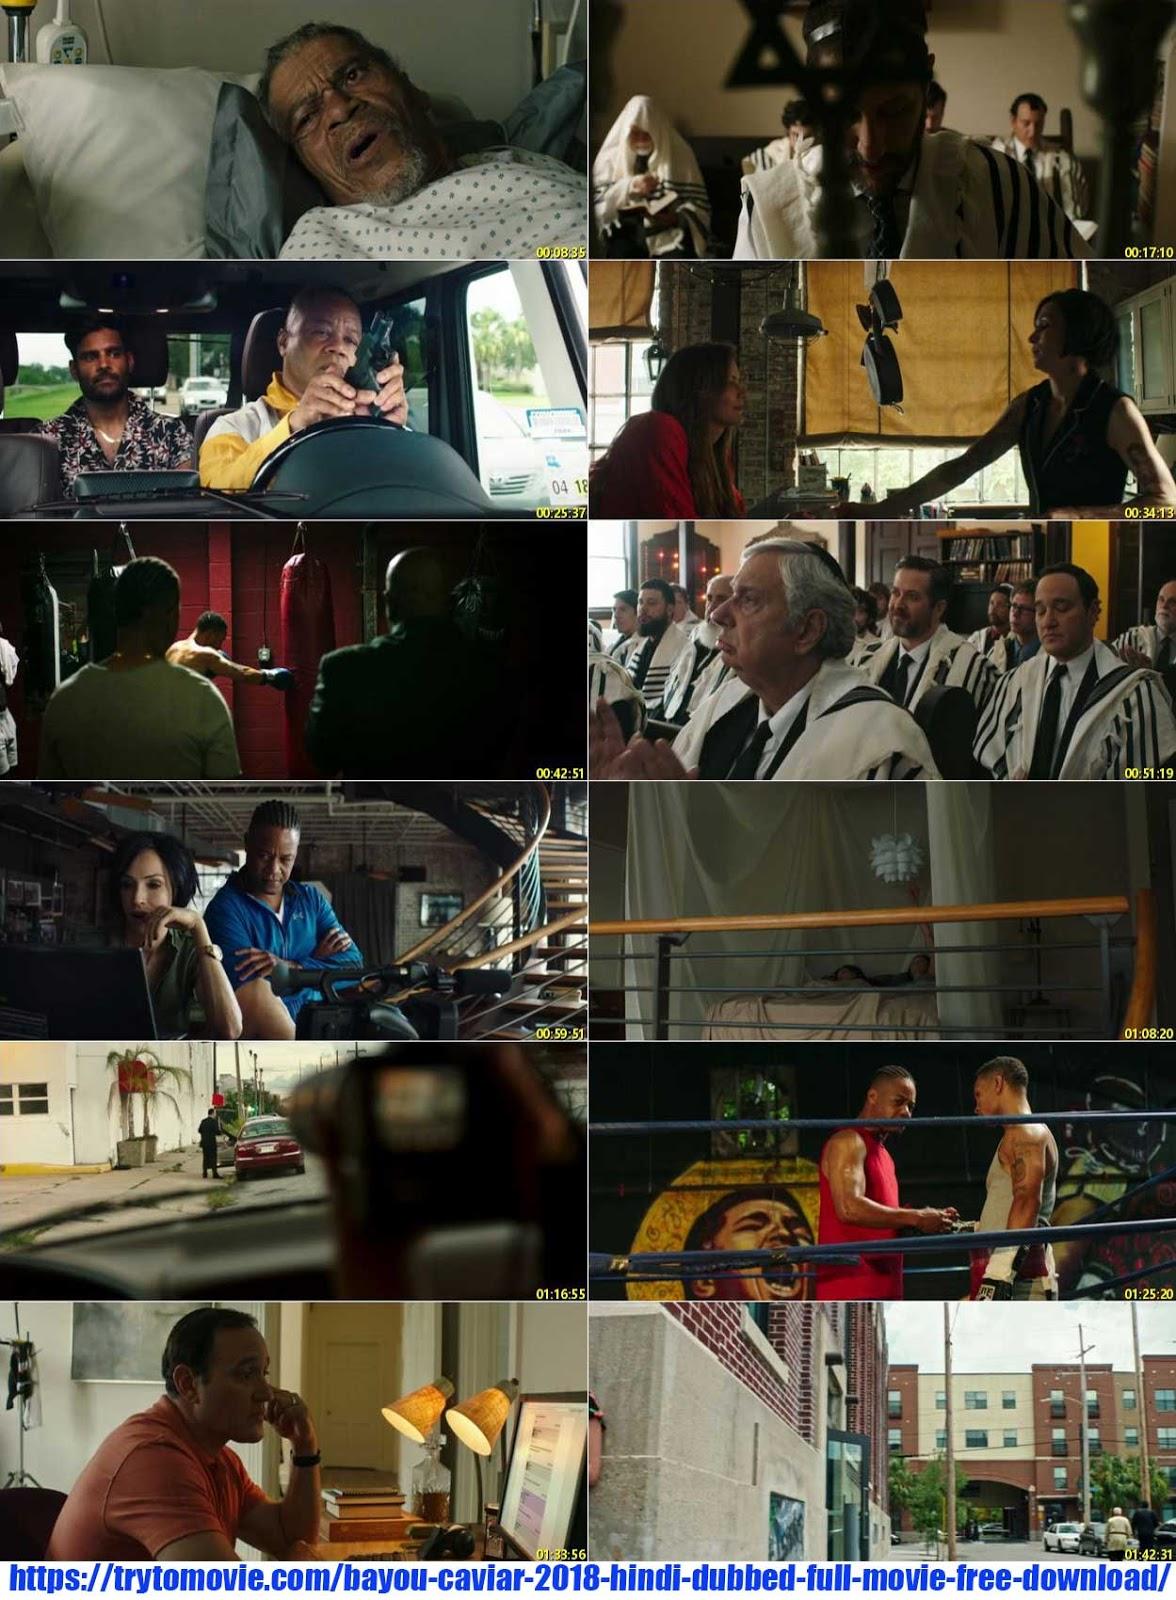 Bayou Caviar 2018 Hindi Dubbed Full Movie Free Download